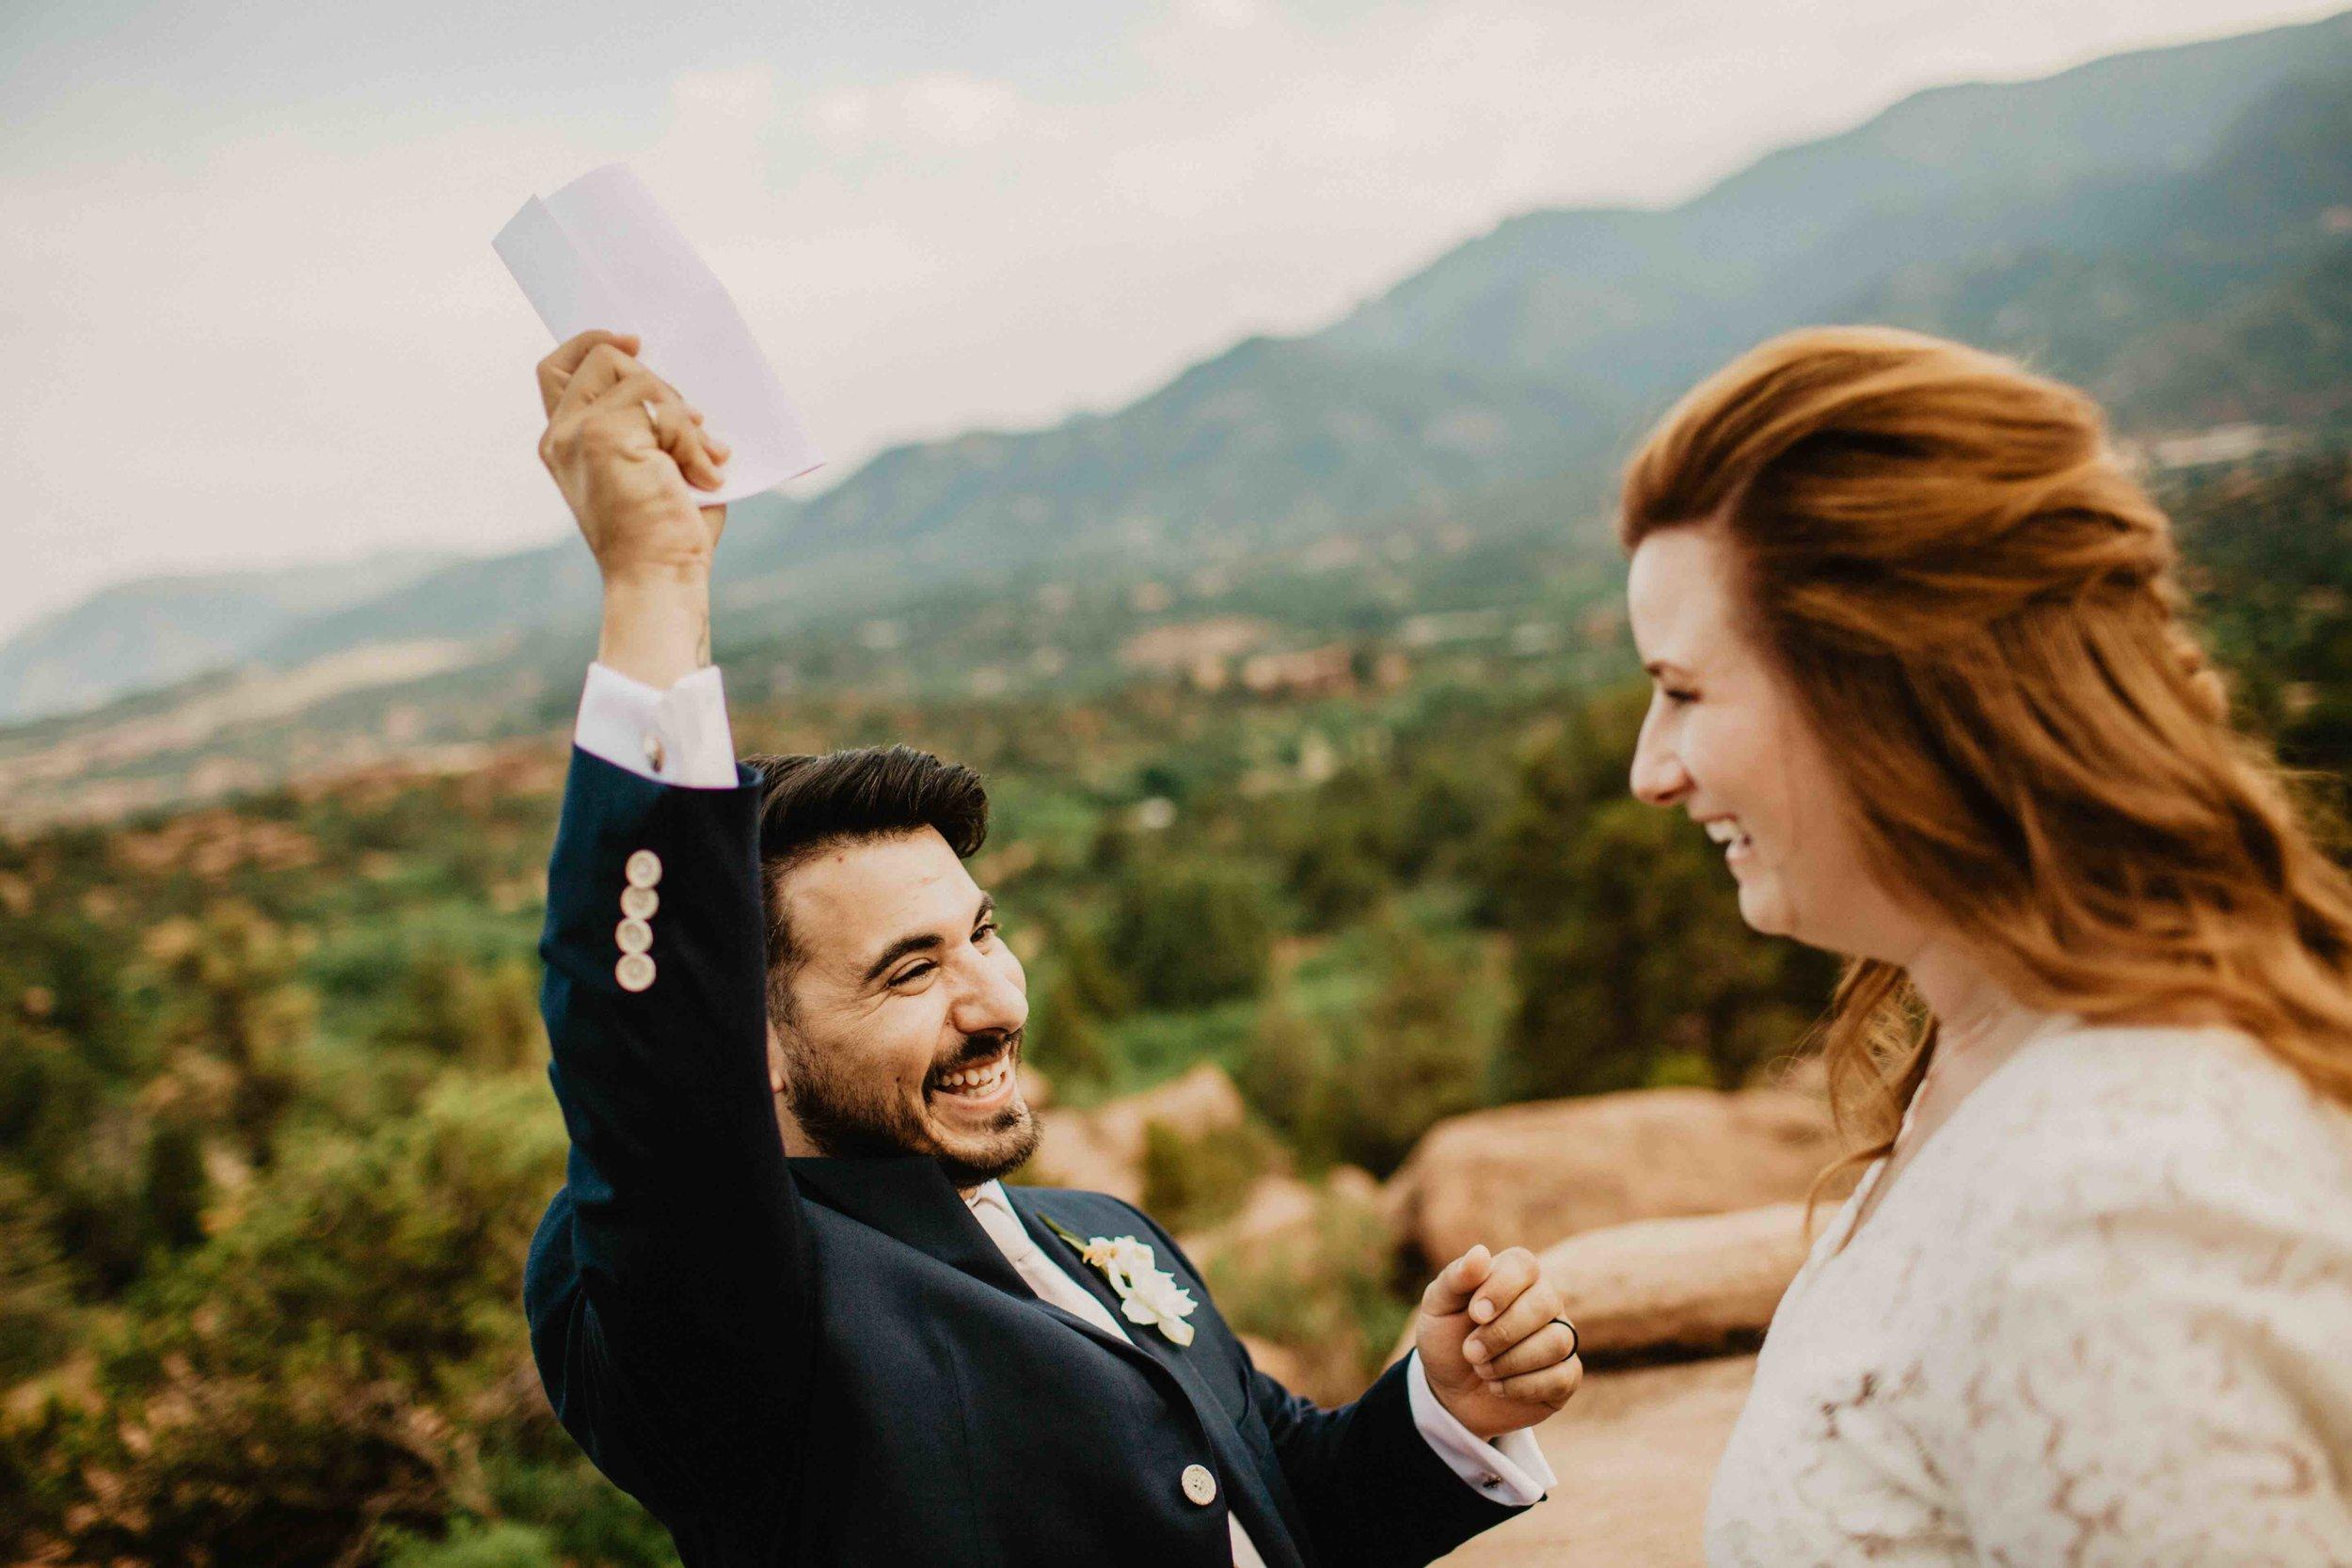 -colorado-wedding-photographer-denver-springs-vail-607A3938.jpeg